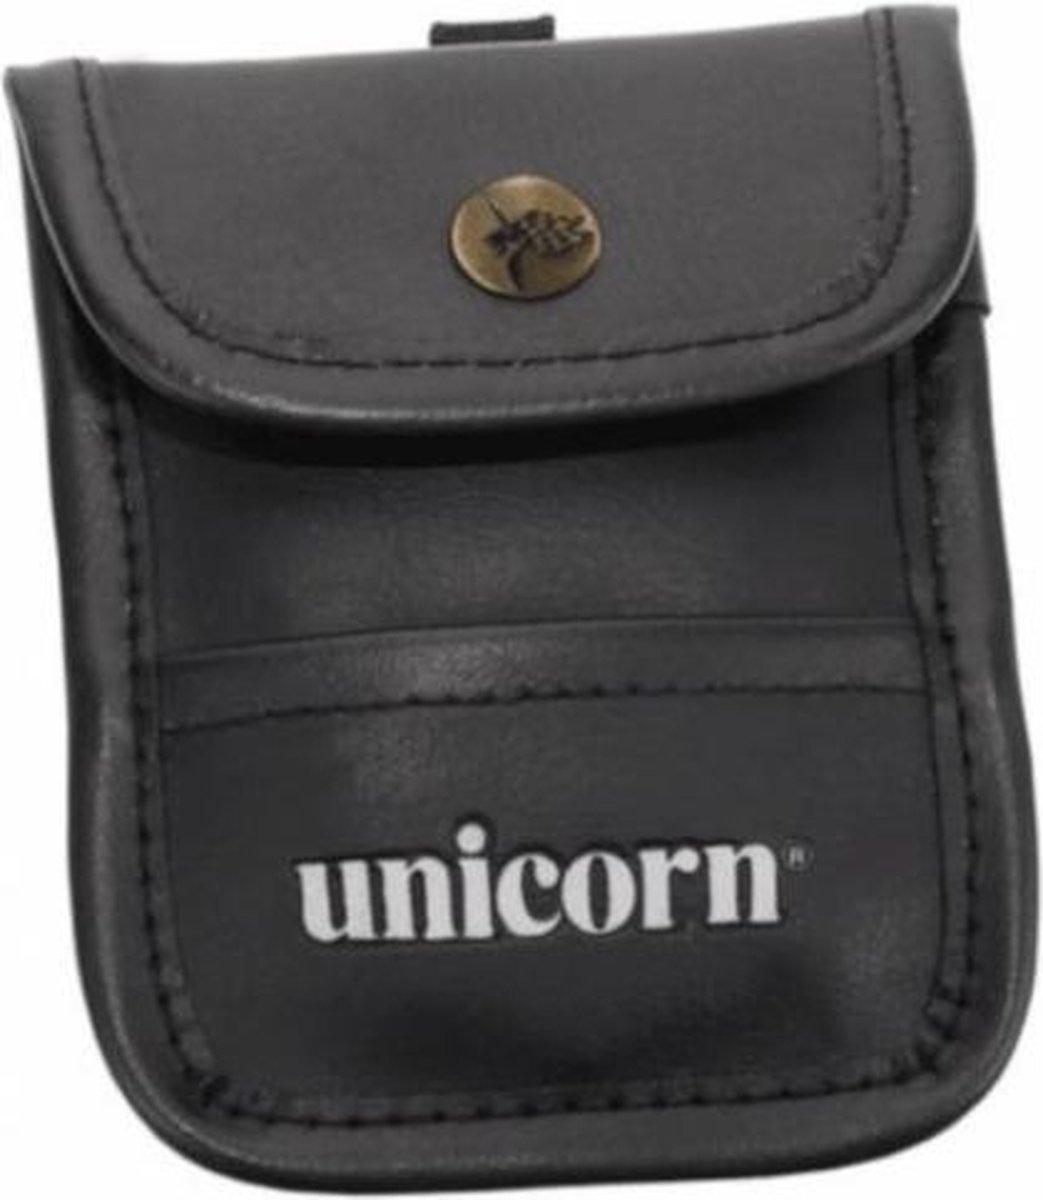 Unicorn Accessory Pouch - Zwart